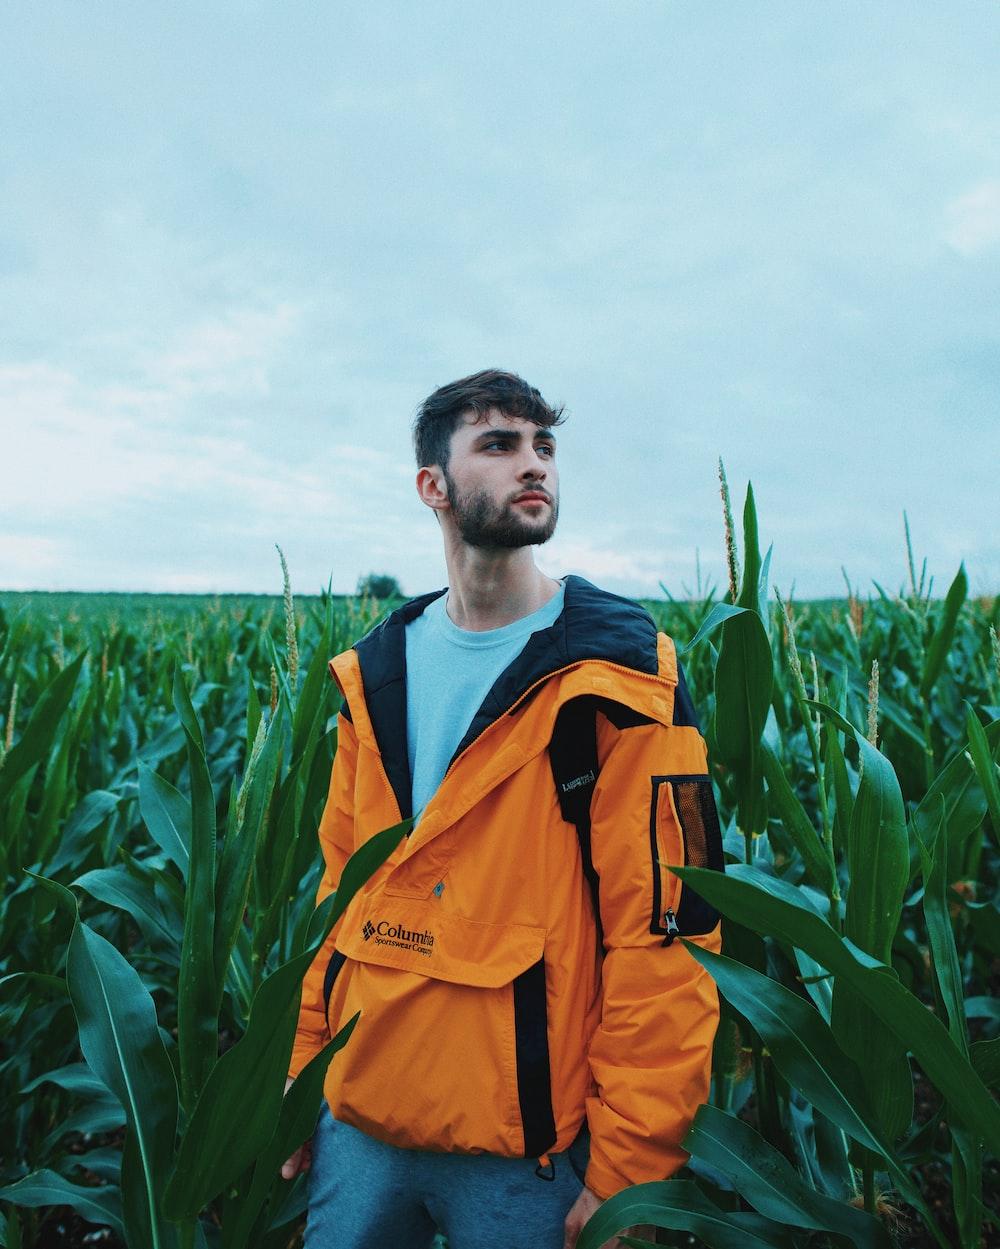 man in orange jacket standing on green grass field during daytime